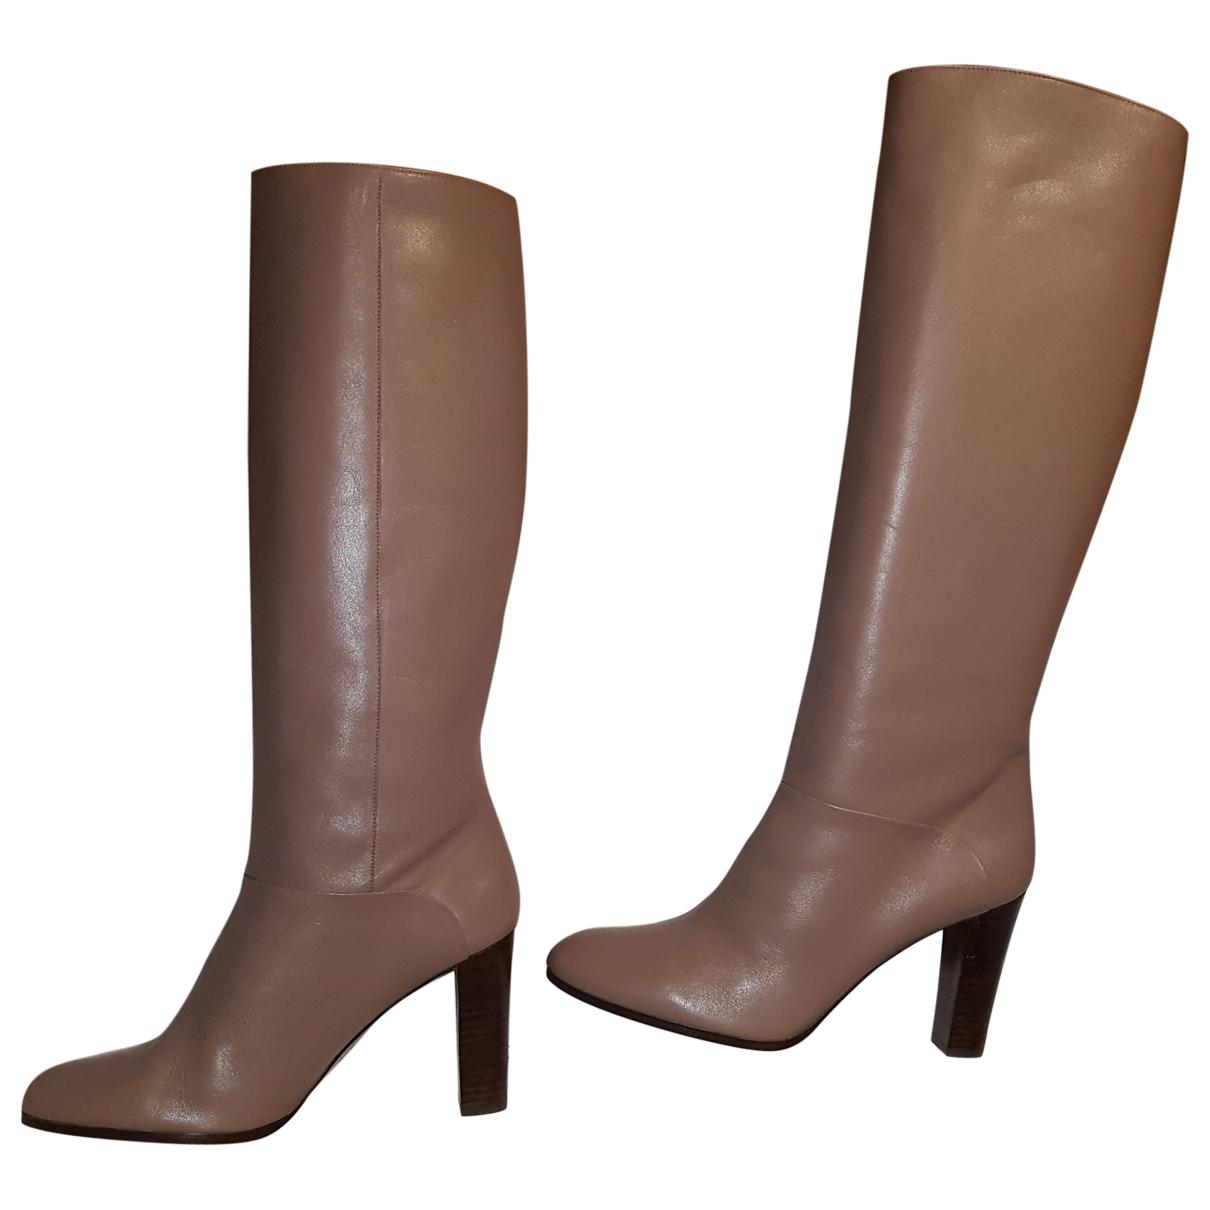 Lk Bennett - Bottes   pour femme en cuir